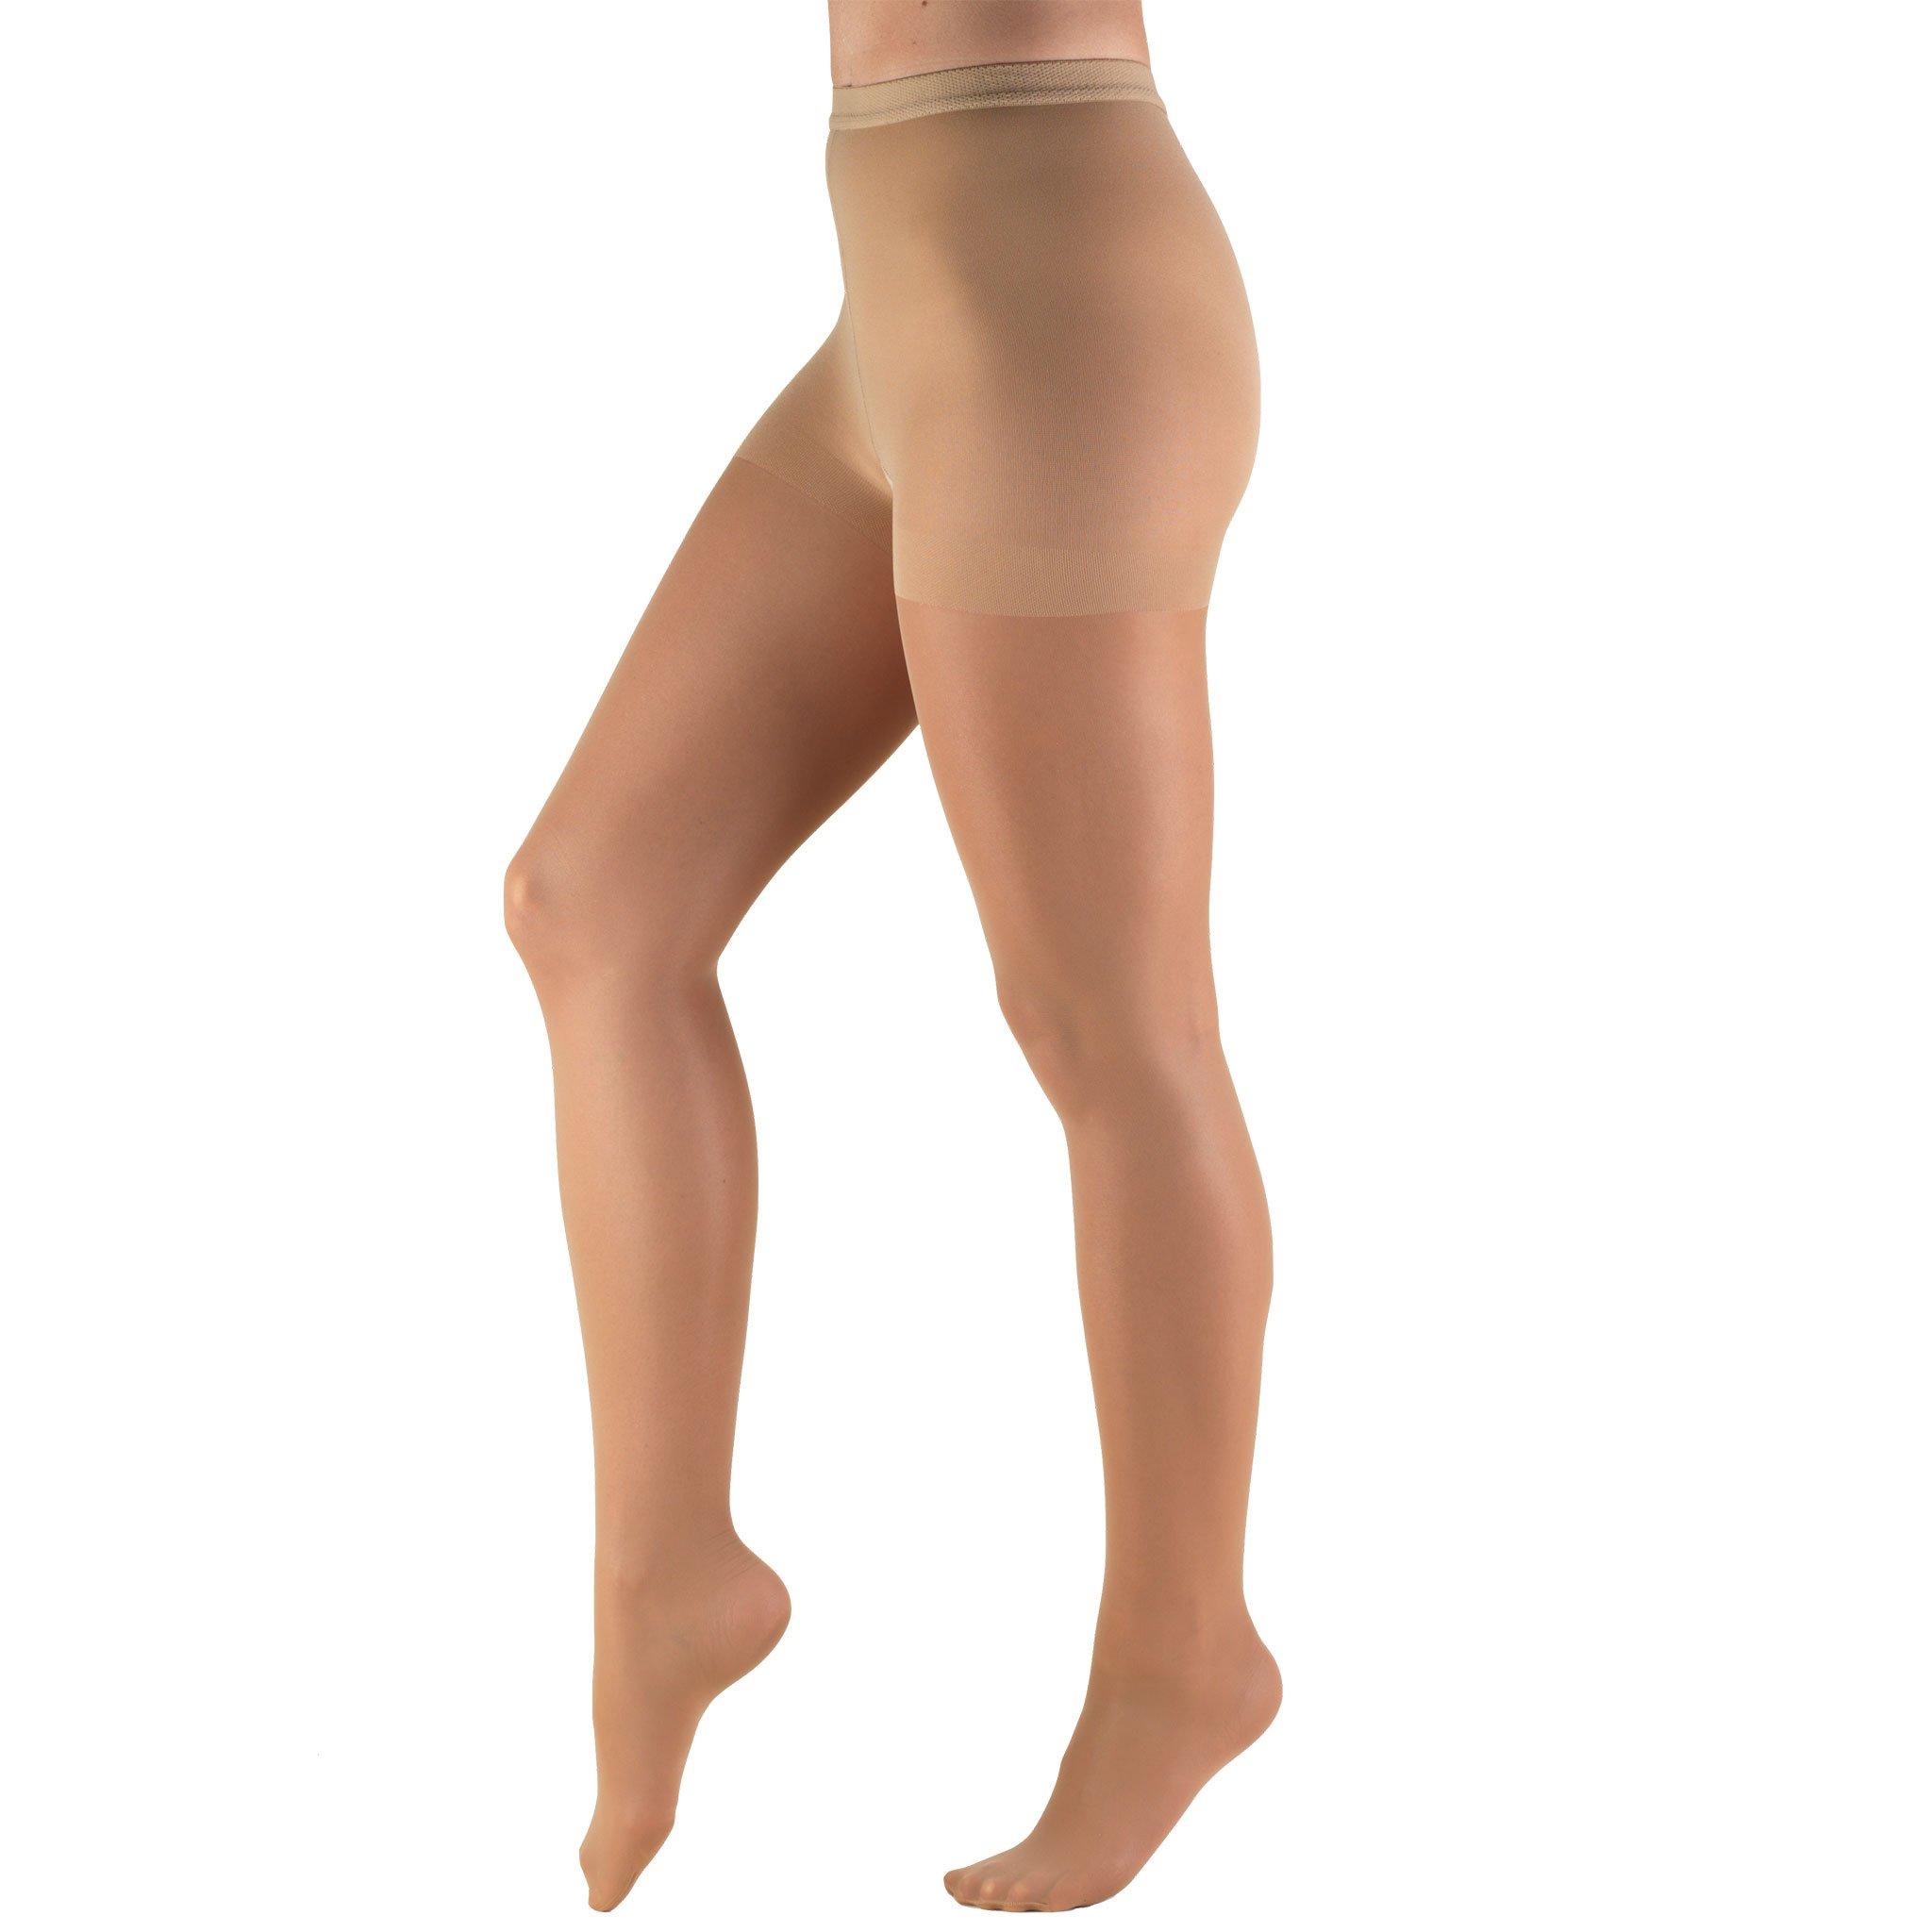 Truform Women's 8-15 mmHg Mild Sheer Compression Pantyhose, Beige, Medium